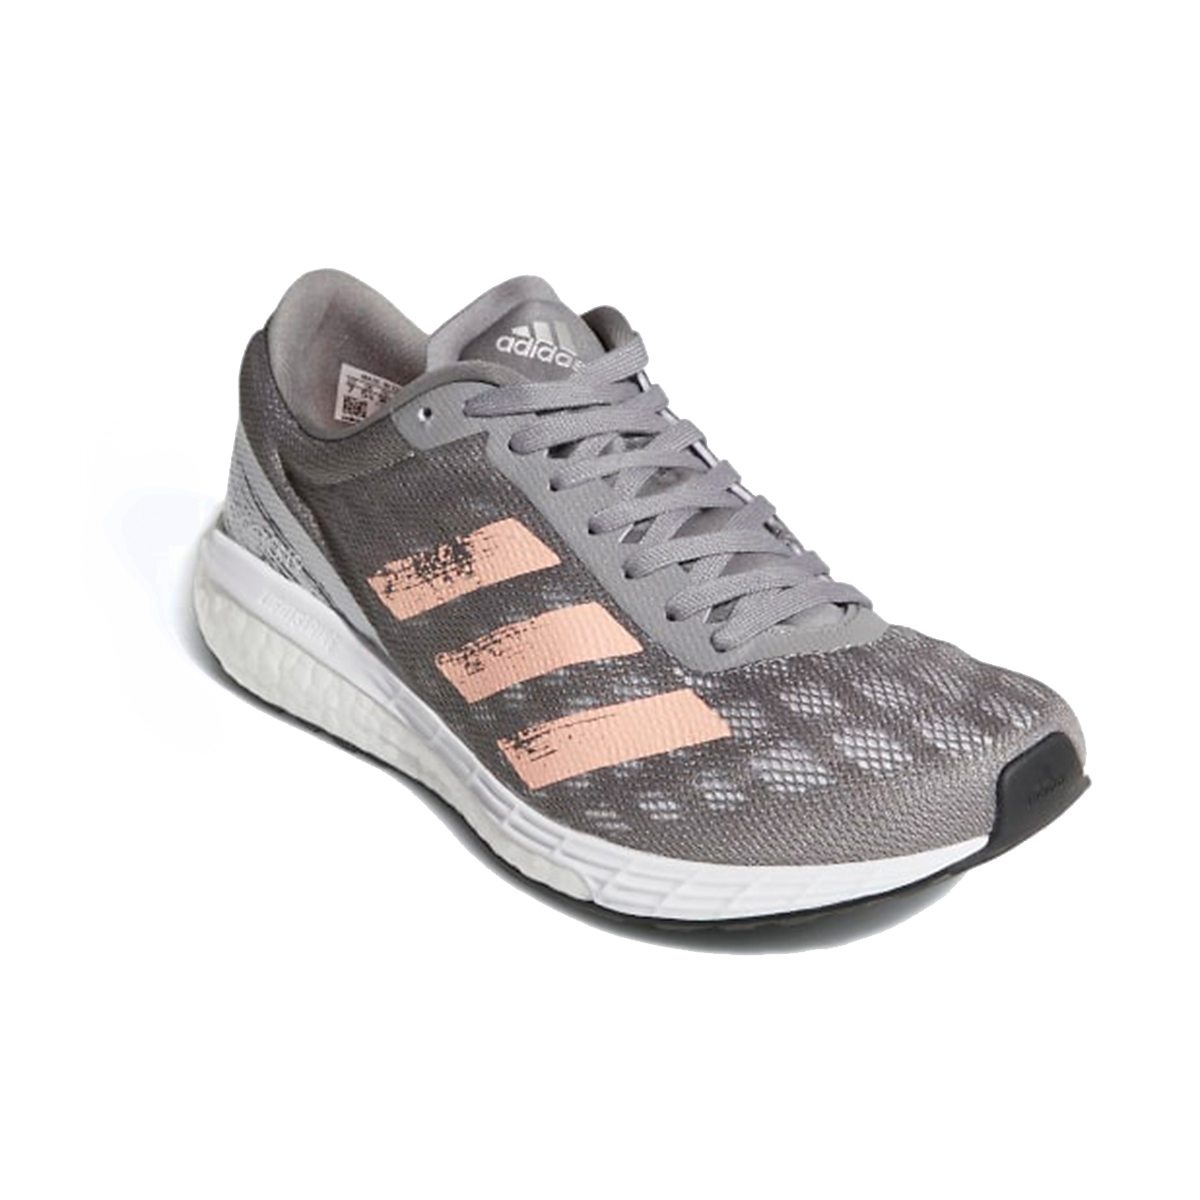 Women's Adidas Adizero Boston 9 Running Shoe - Color: Grey/Light Flash Orange/Silver Metallic - Size: 5 - Width: Regular, Grey/Light Flash Orange/Silver Metallic, large, image 4